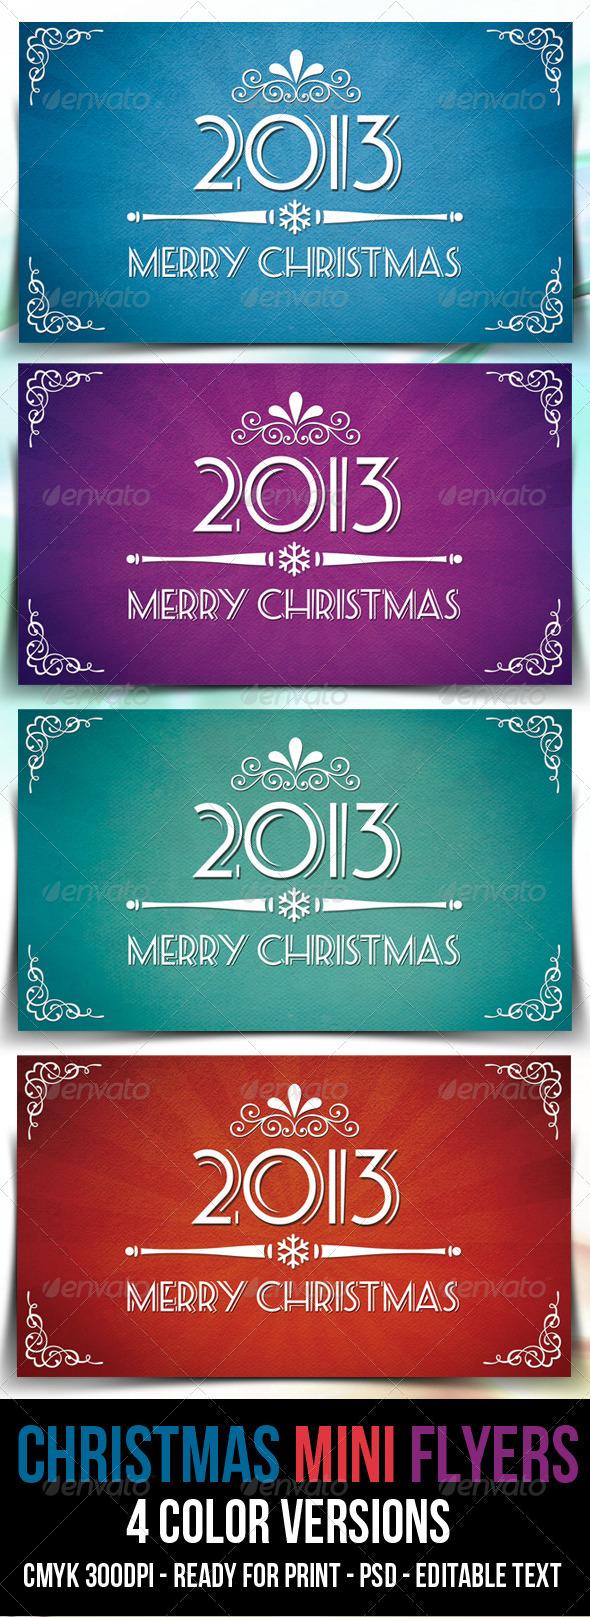 GraphicRiver Retro Mini Flyers for Christmas 3663631